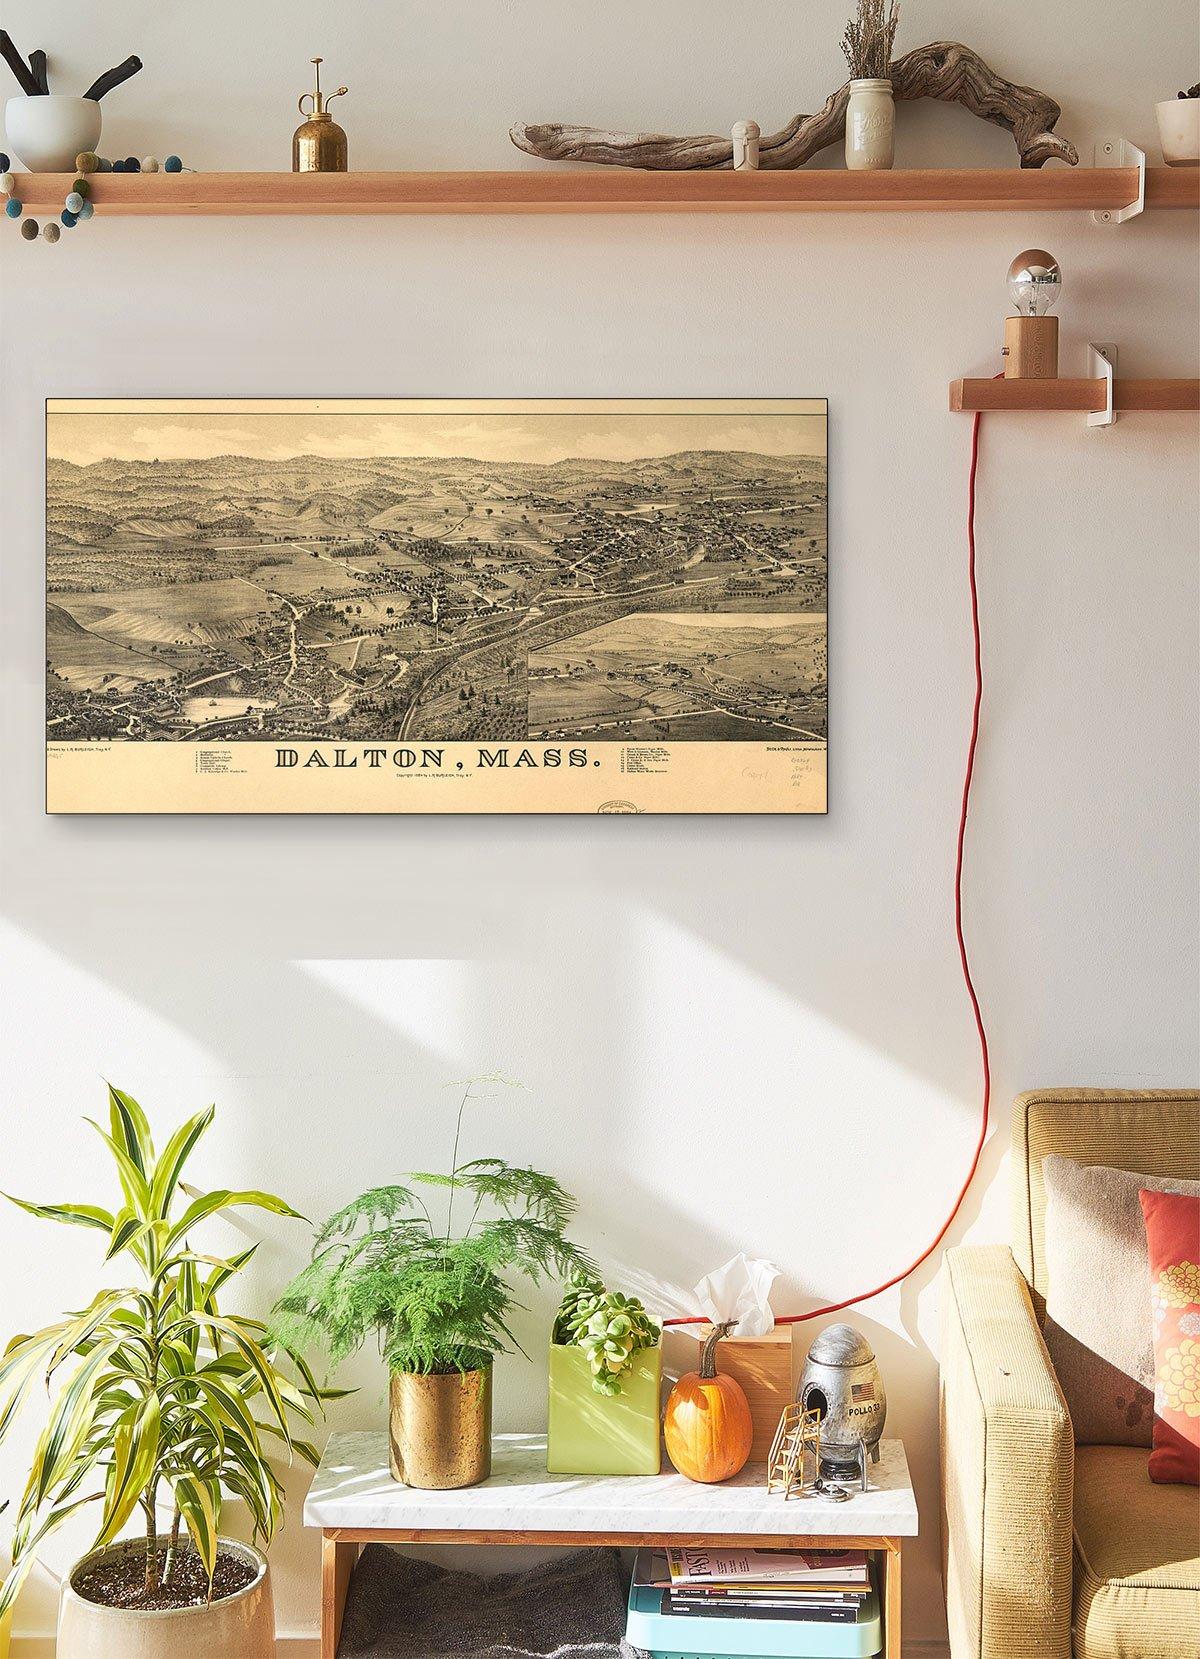 Dalton Mass LARGE Vintage Map